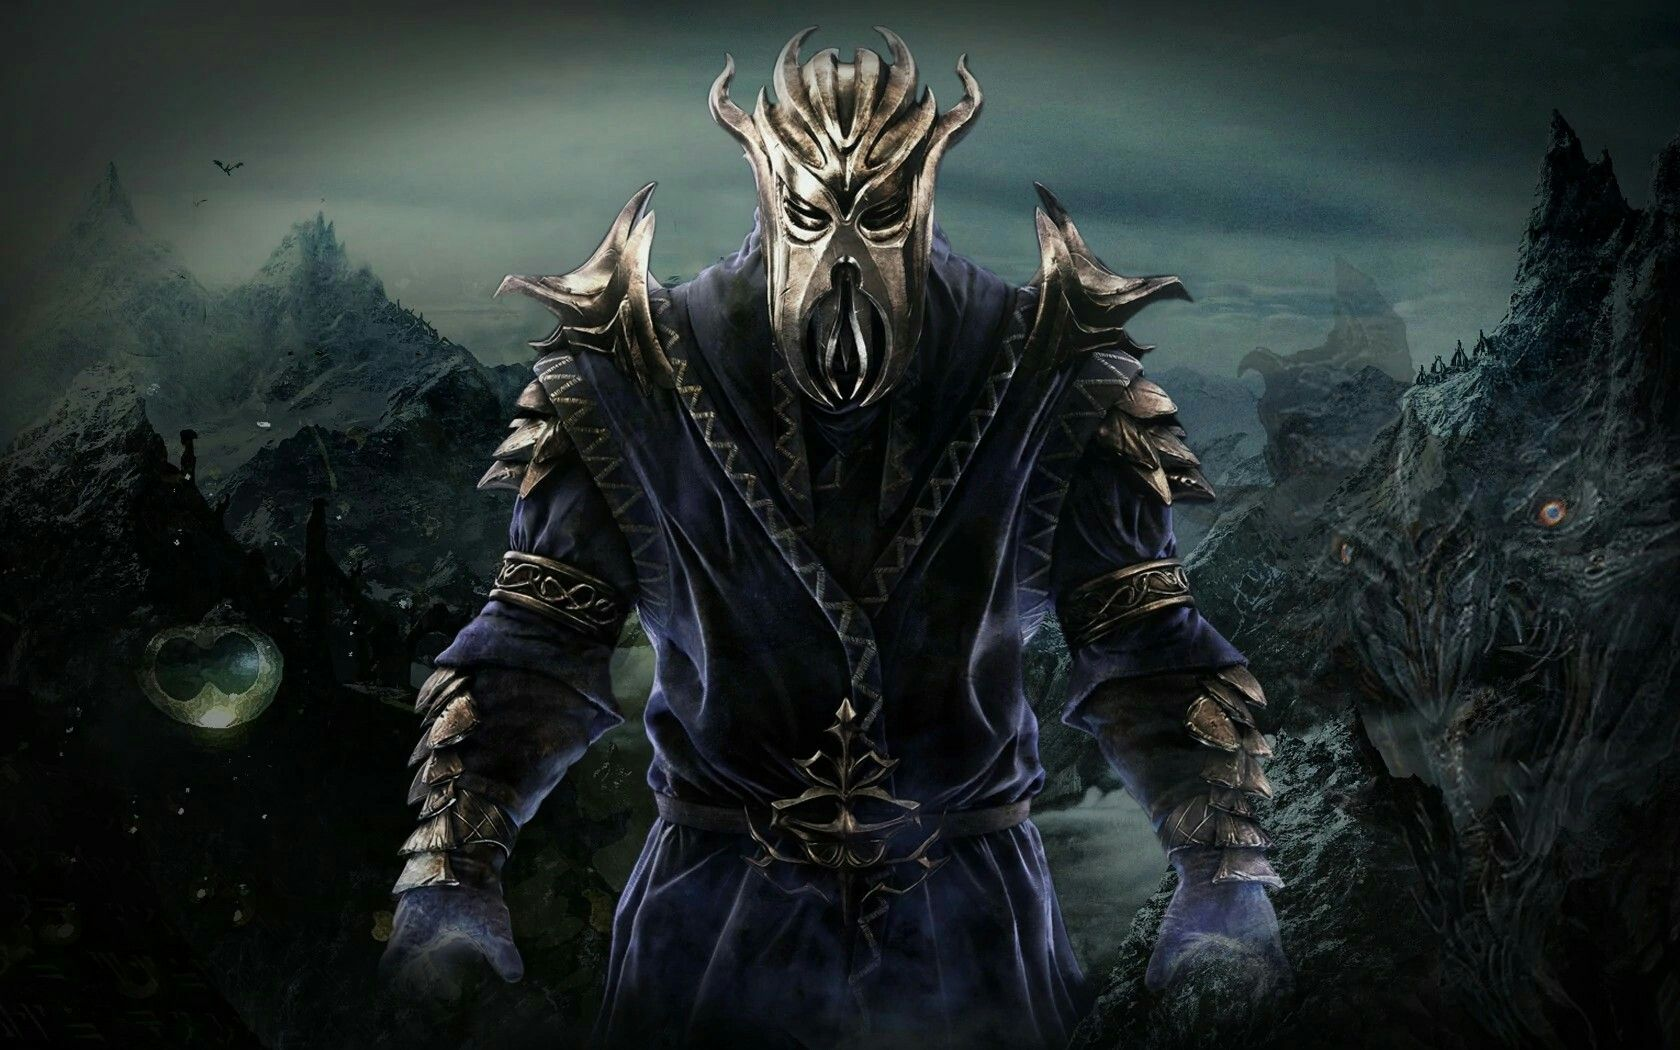 Miraak The Dragonborn D Skyrim Wallpaper Skyrim Elder Scrolls